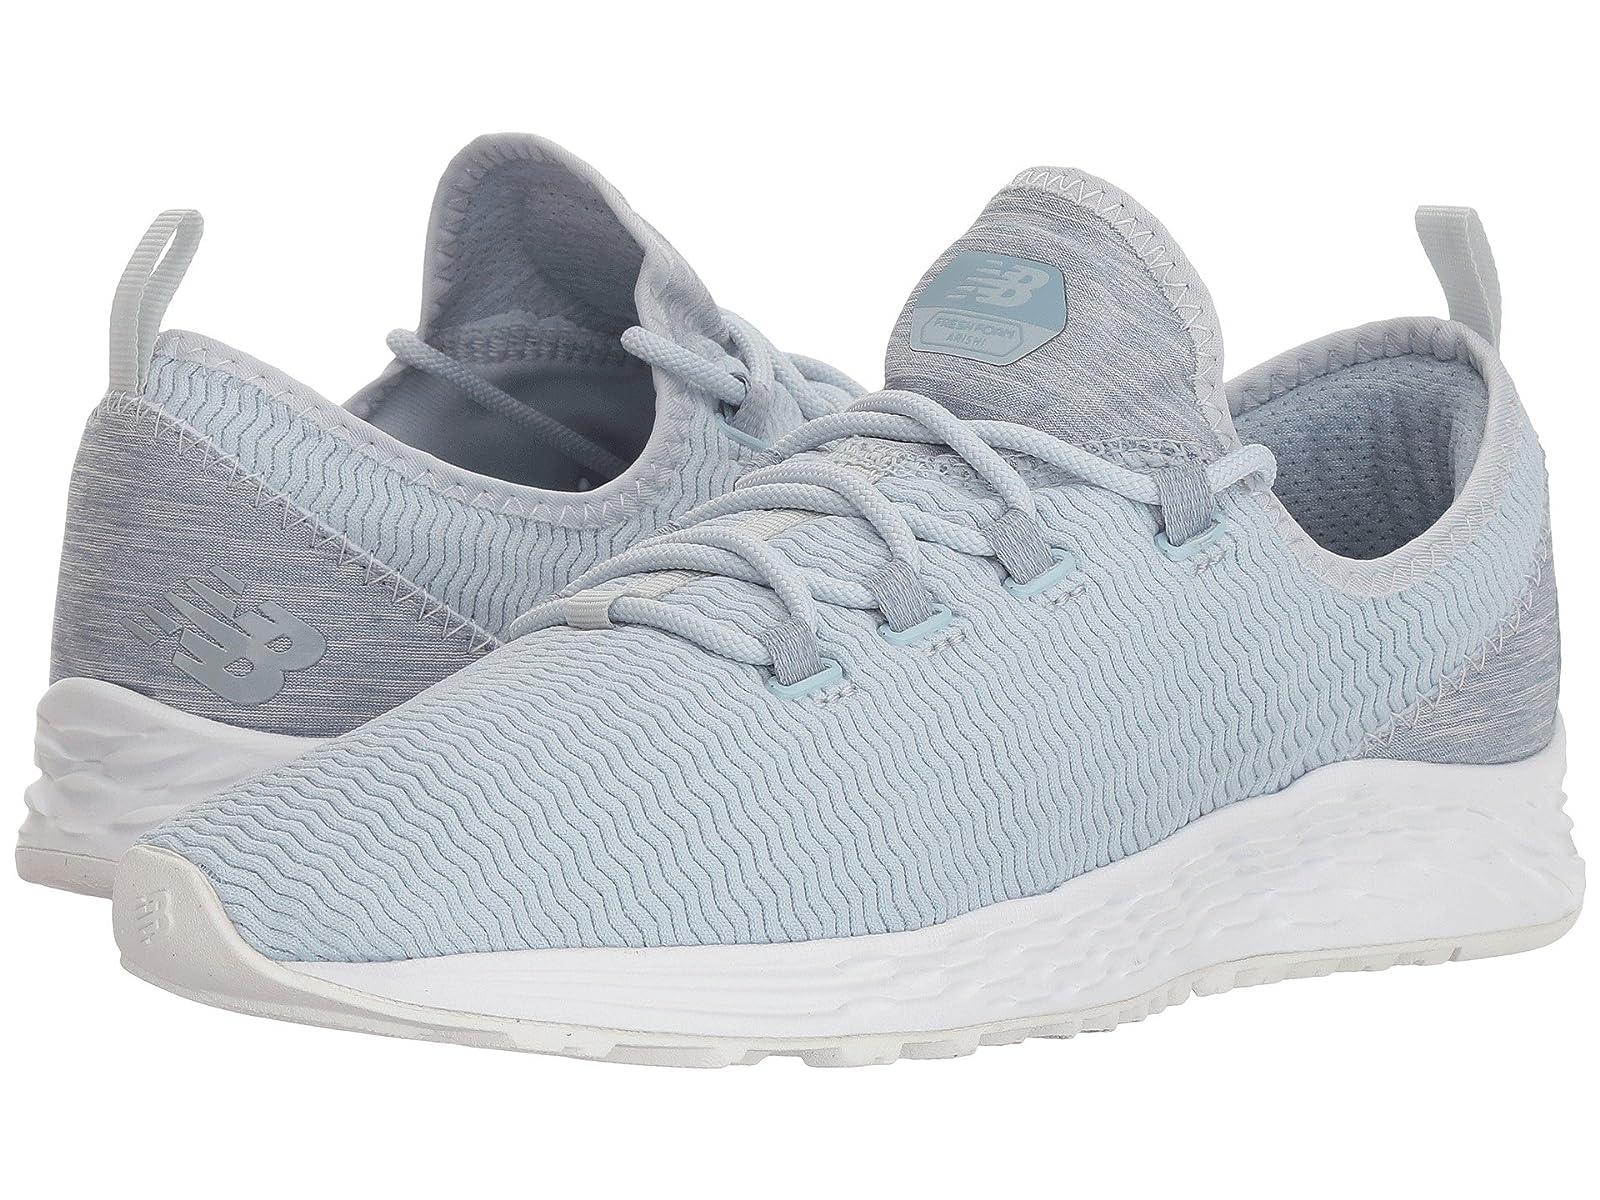 New Balance Arishi Sport v1Atmospheric grades have affordable shoes